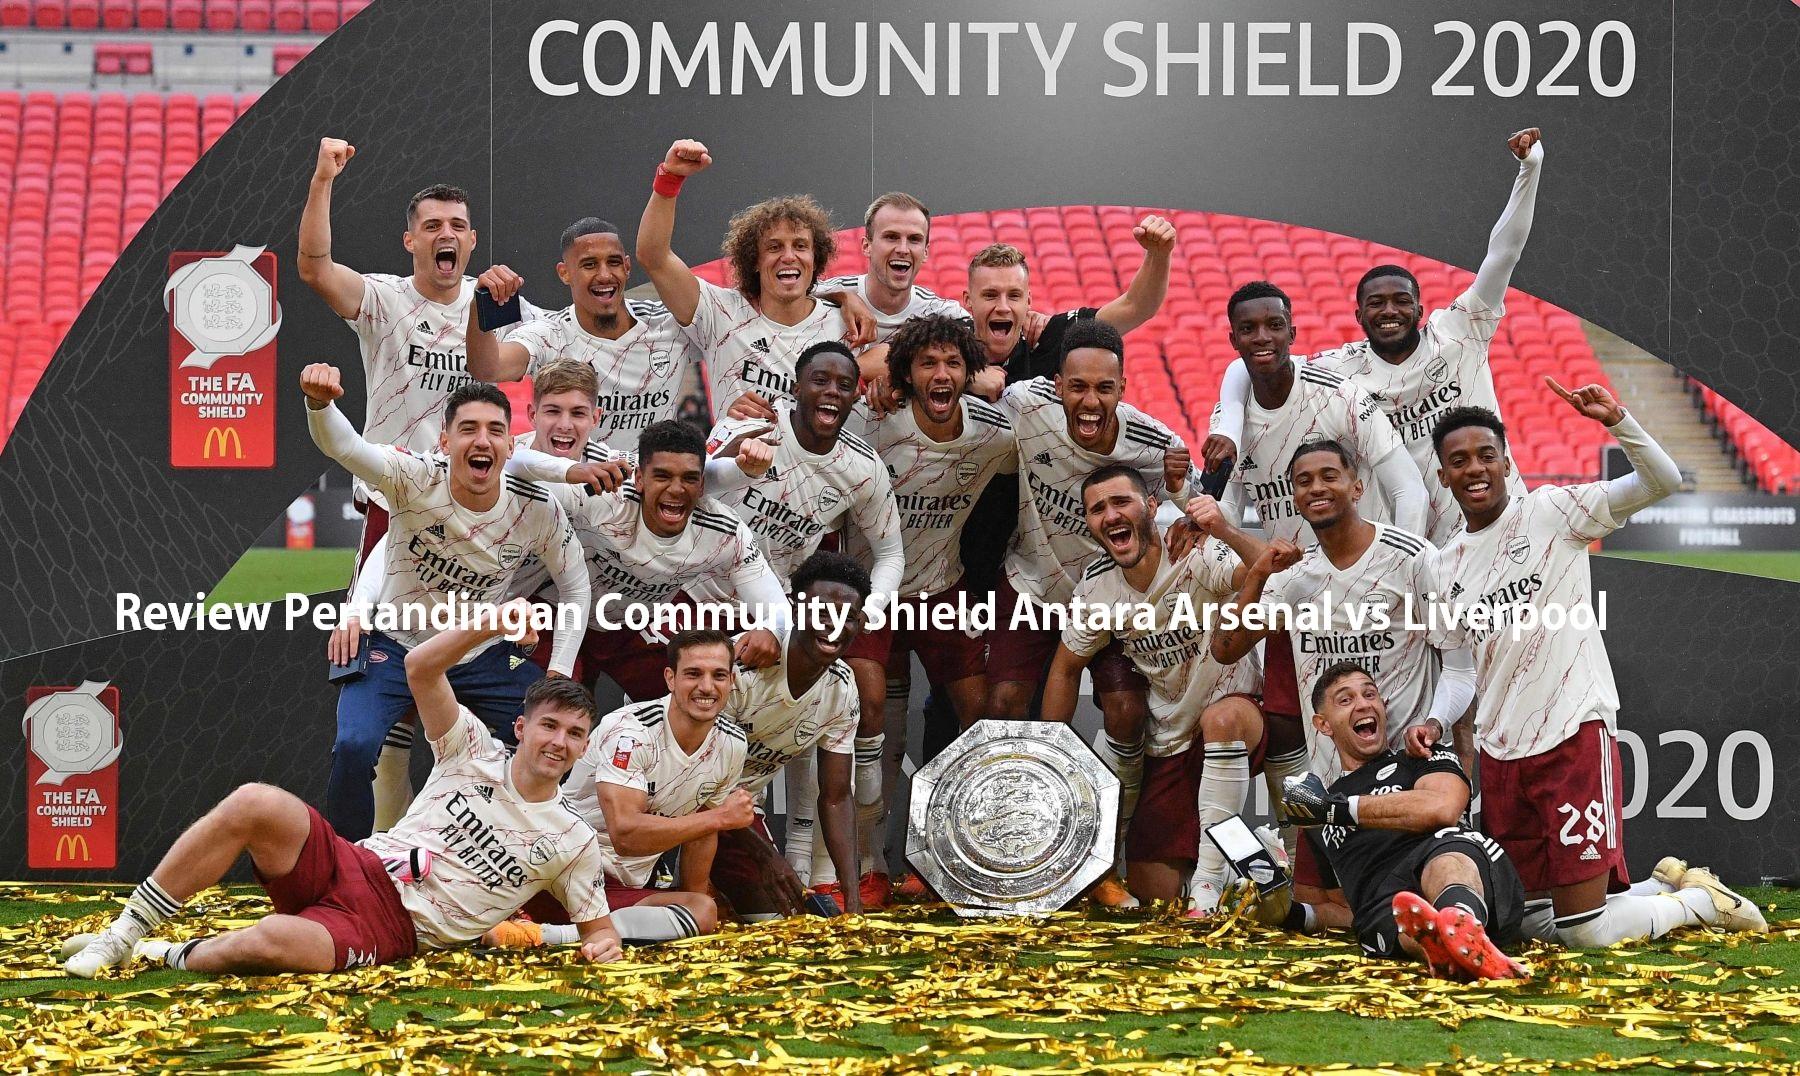 Review Pertandingan Community Shield Antara Arsenal vs Liverpool